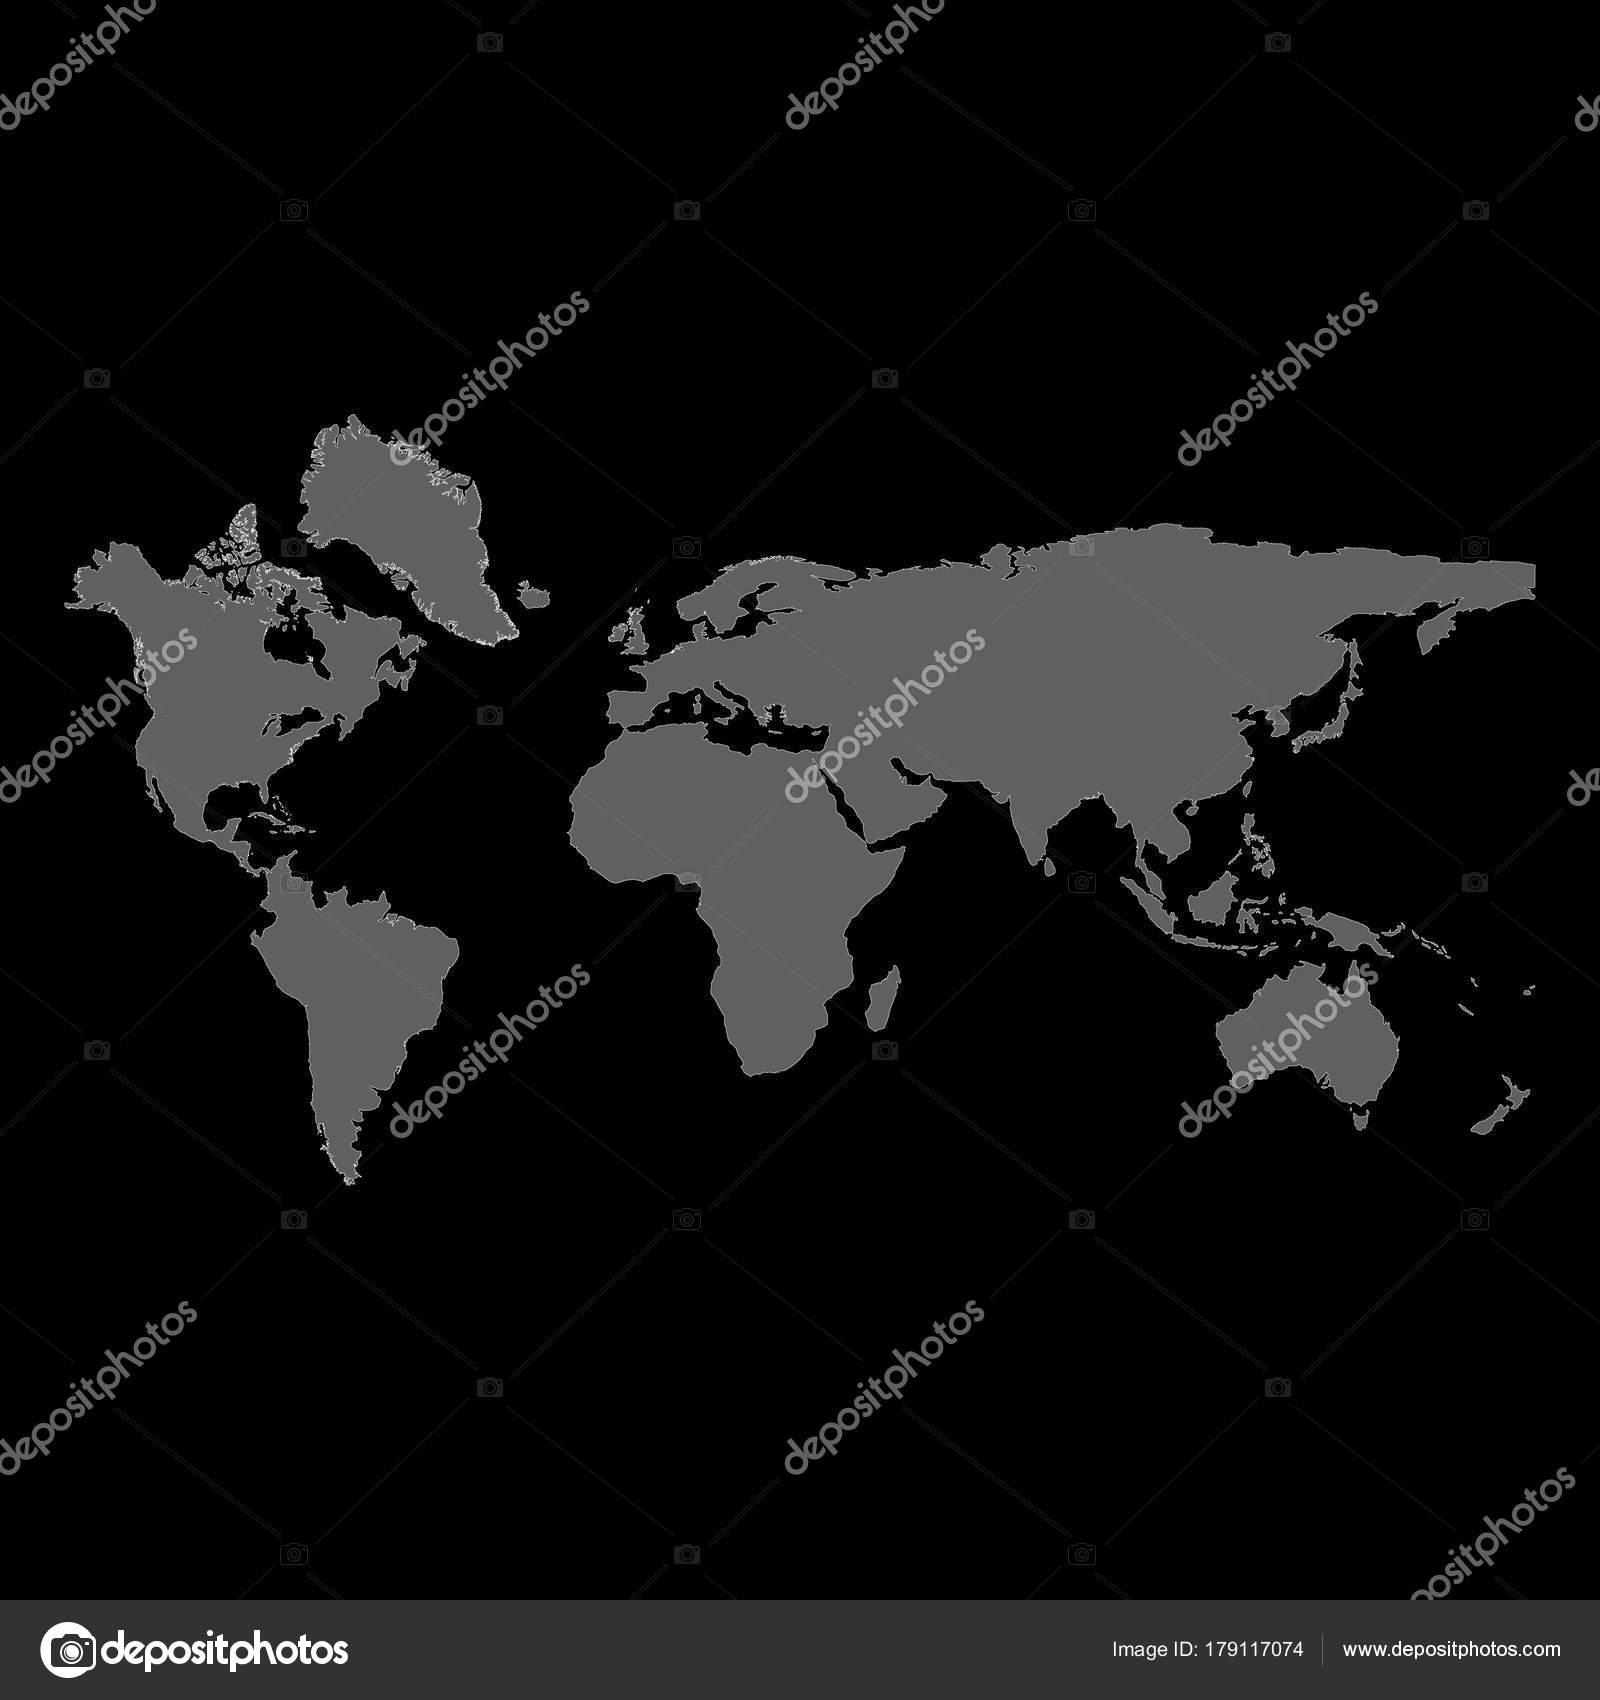 World map raster stock photo viktorijareut 179117074 raster illustration grey blank raster world map isolated on black background photo by viktorijareut gumiabroncs Gallery